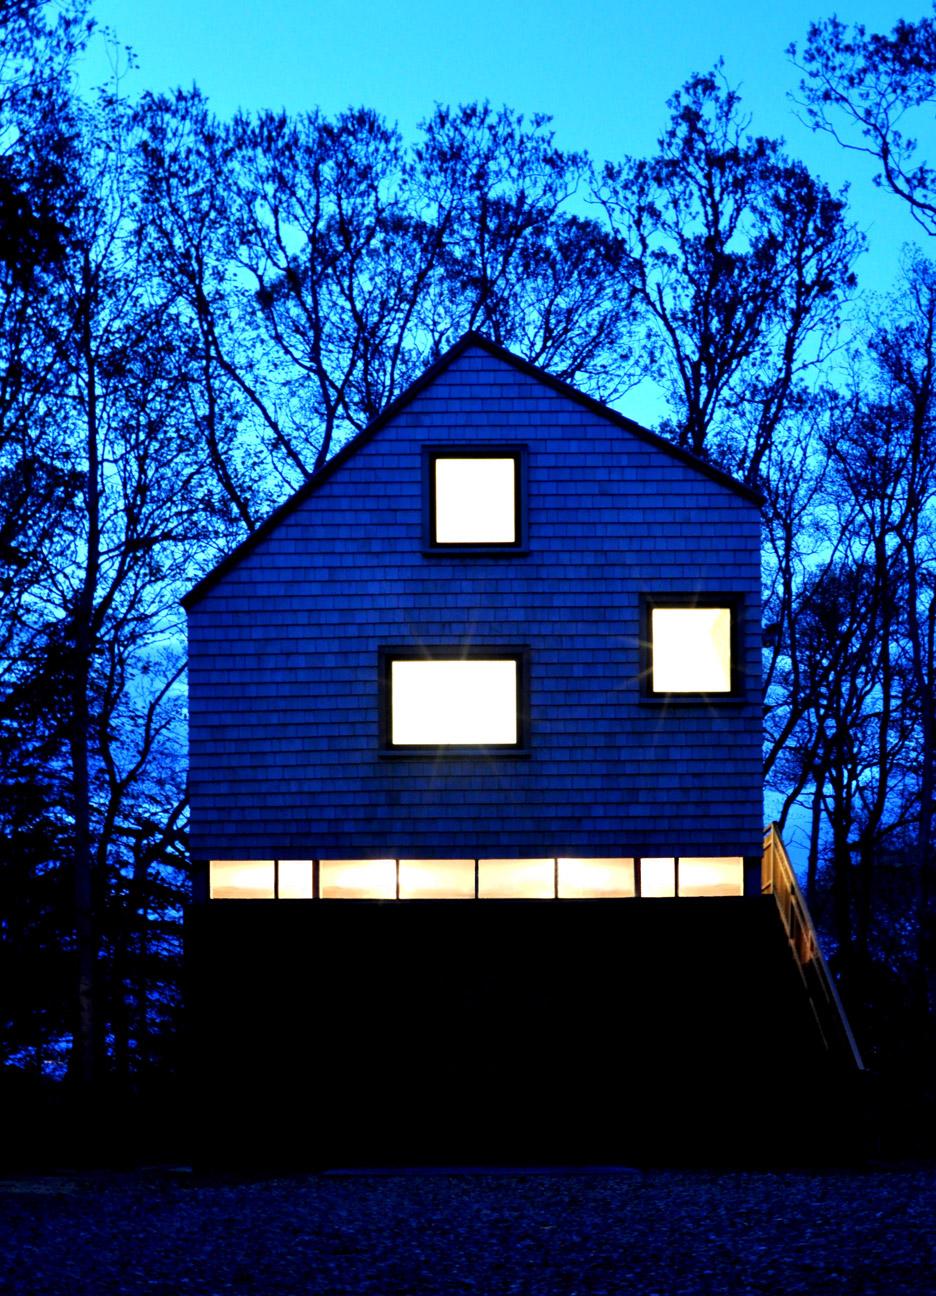 Tree House by Nicholas Waldman